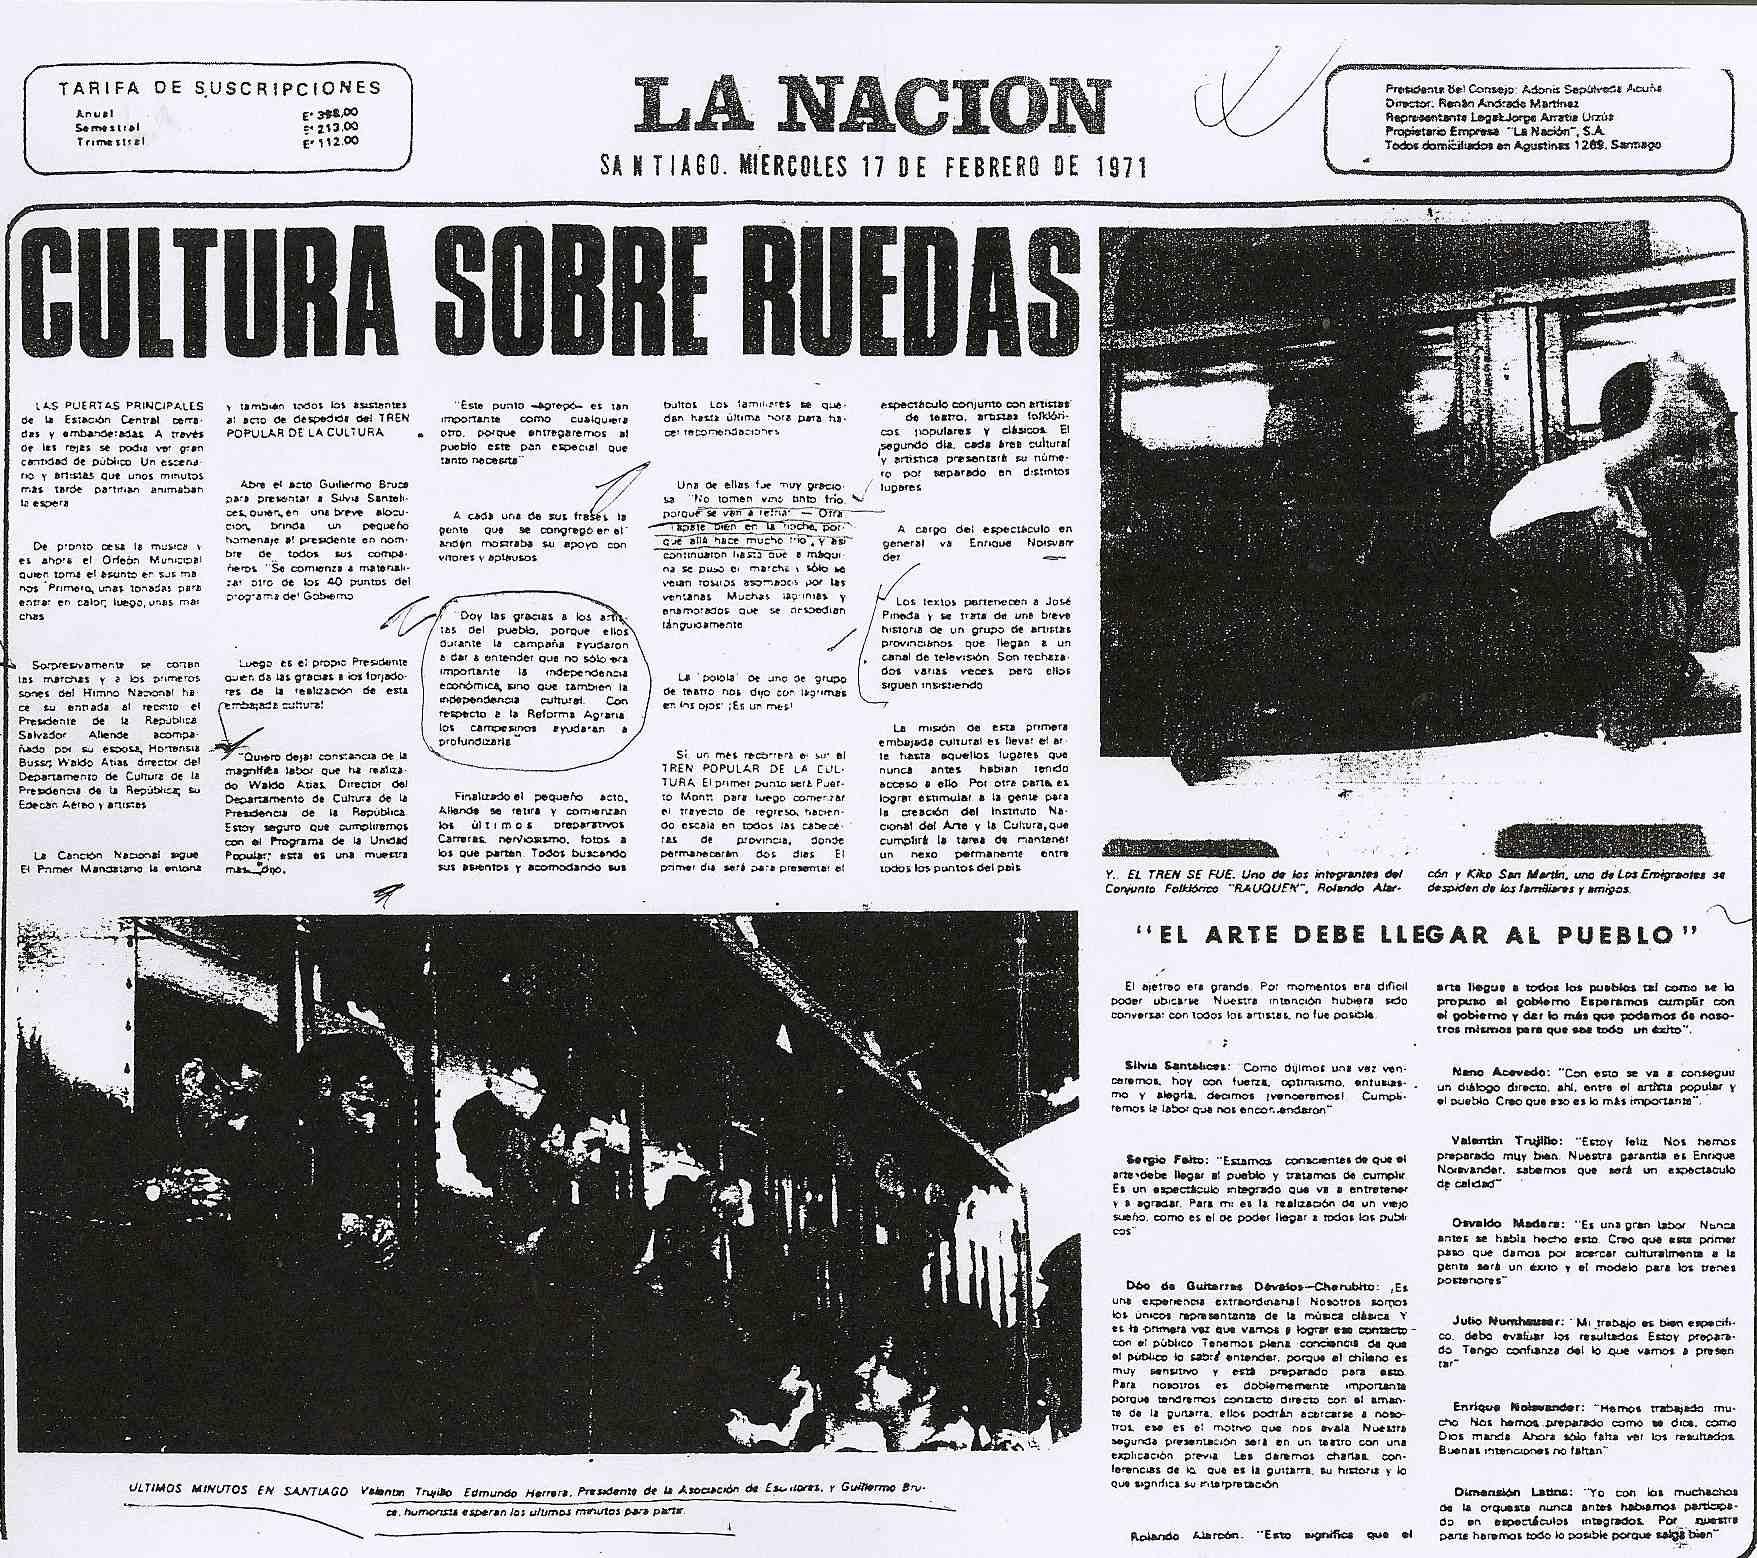 diario la nacion chile 1971-1